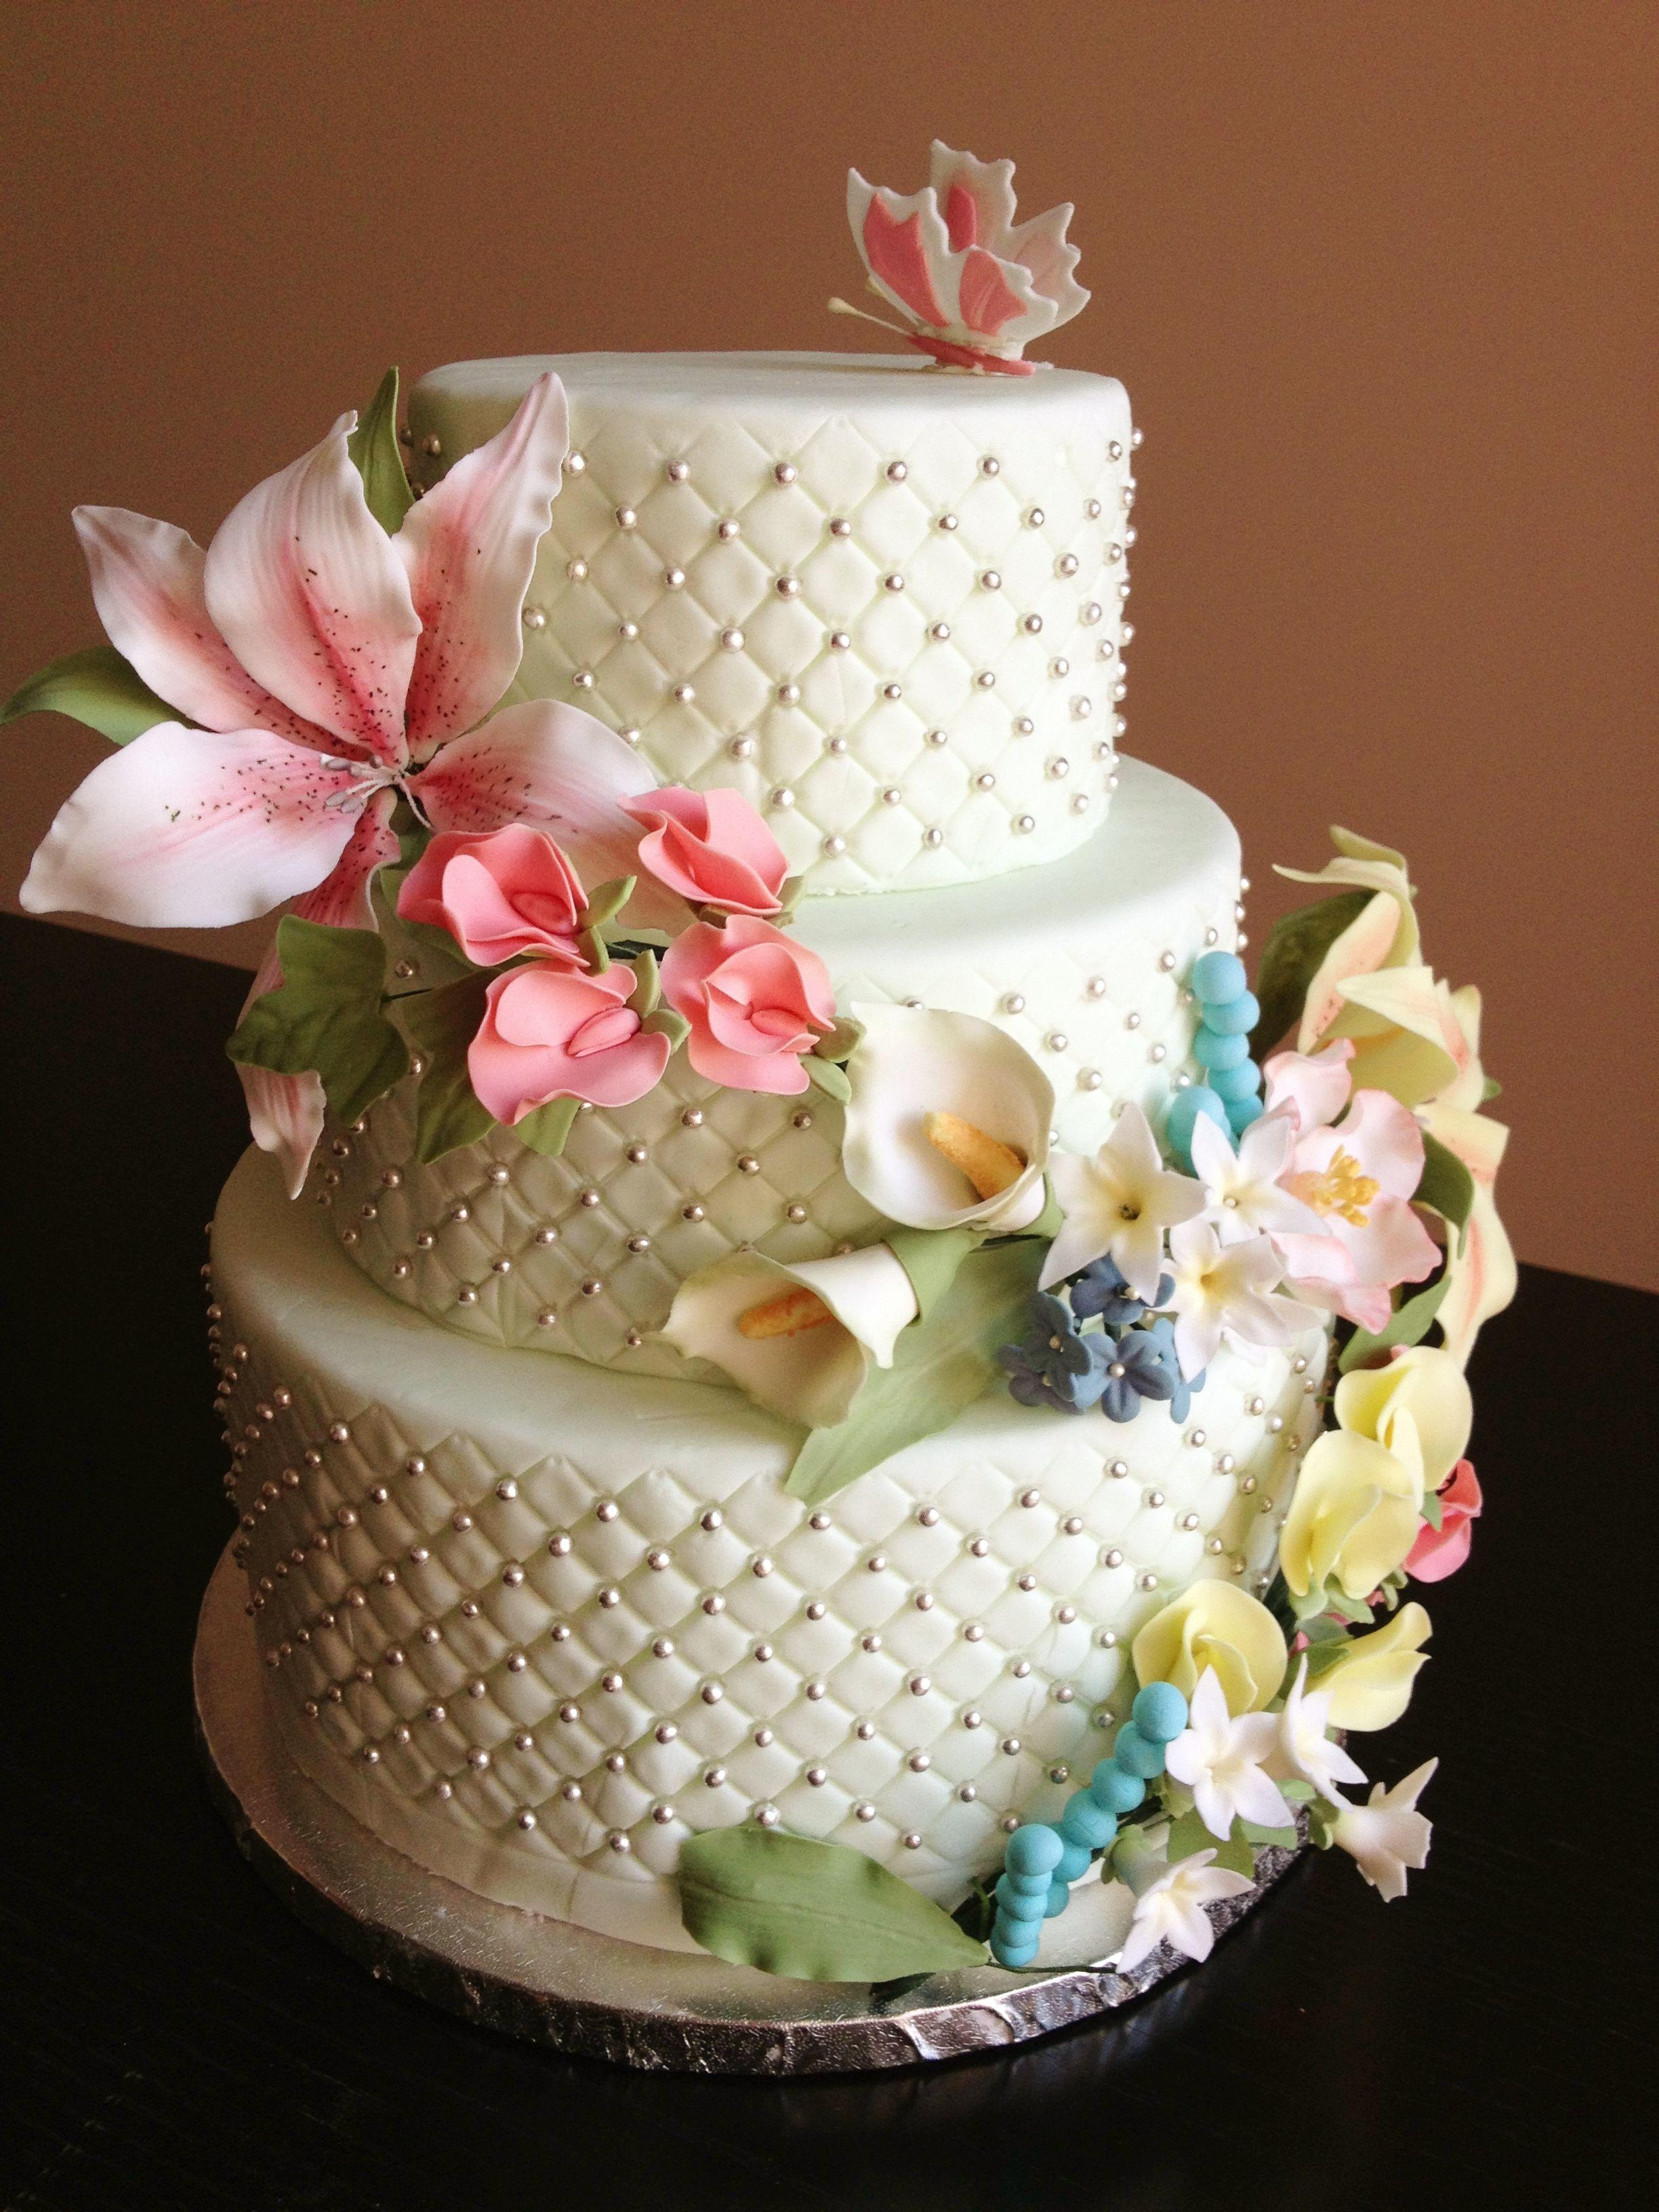 Lily Rose Cake Design : Fondant 3-tier cake with gum paste flowers? Stargazer lily ...